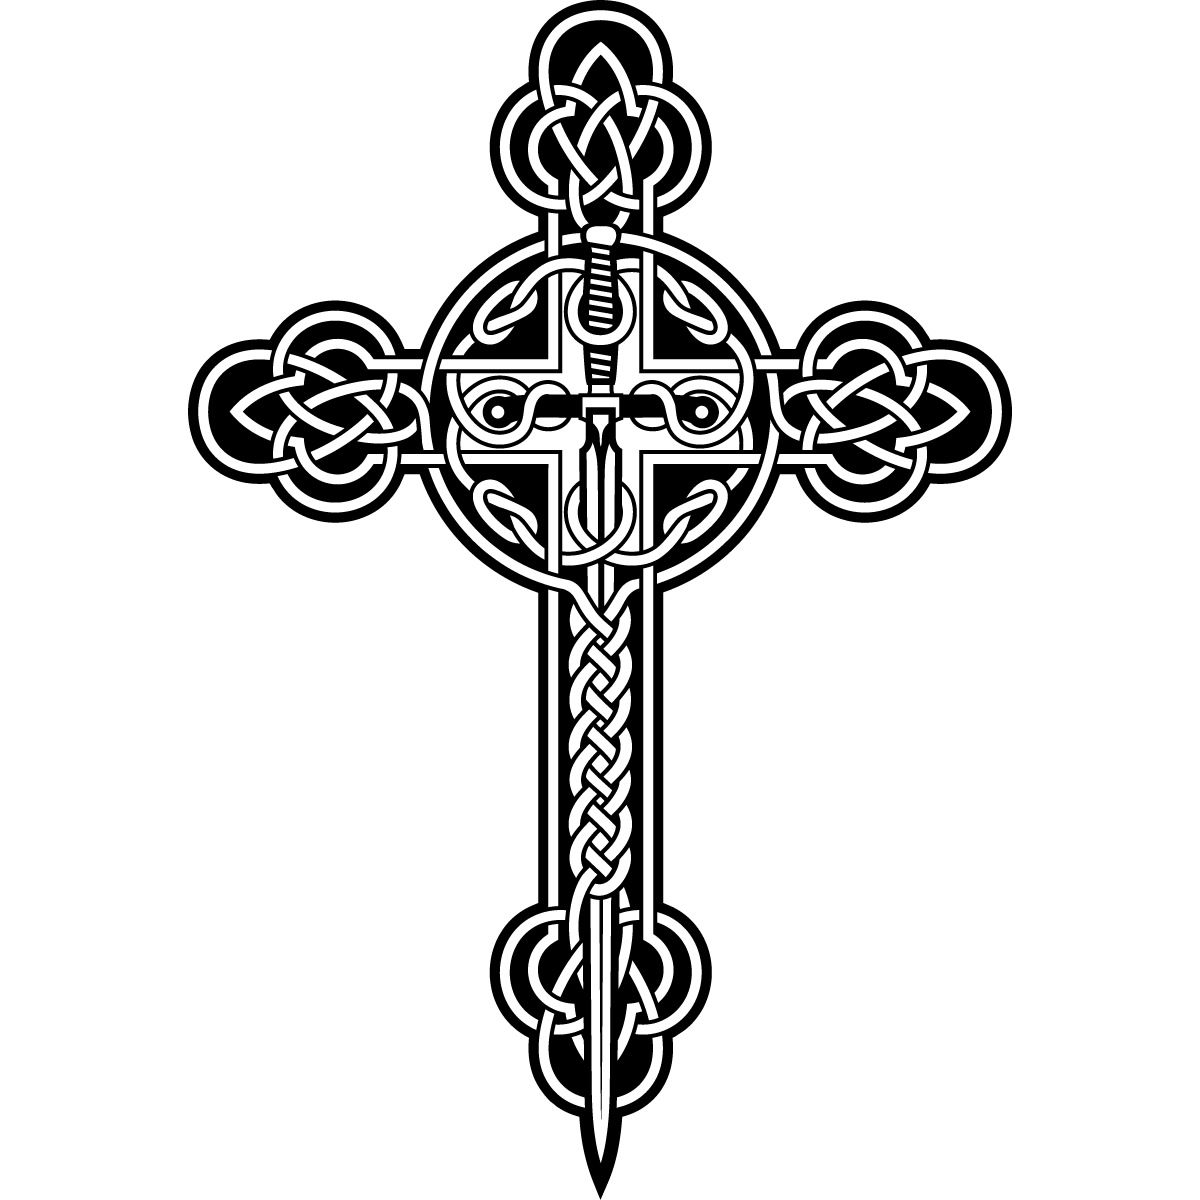 Celtic Cross Wall Art Sticker Wall Decals Transfers ...